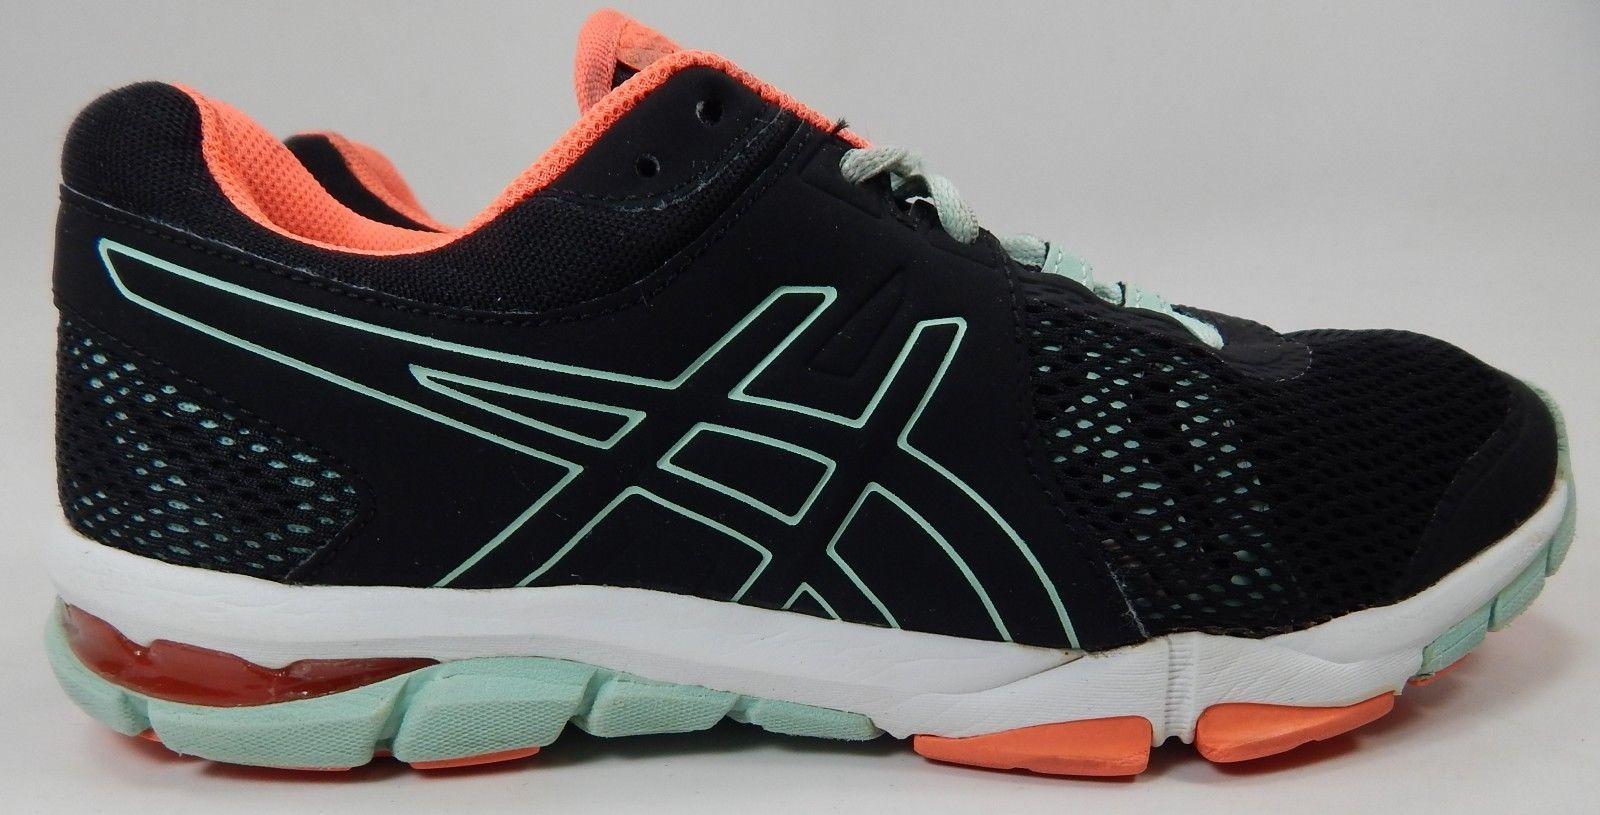 Asics Gel Craze TR 4 Size 8.5 M (B) EU 40 Women's Training / Running Shoes S755N